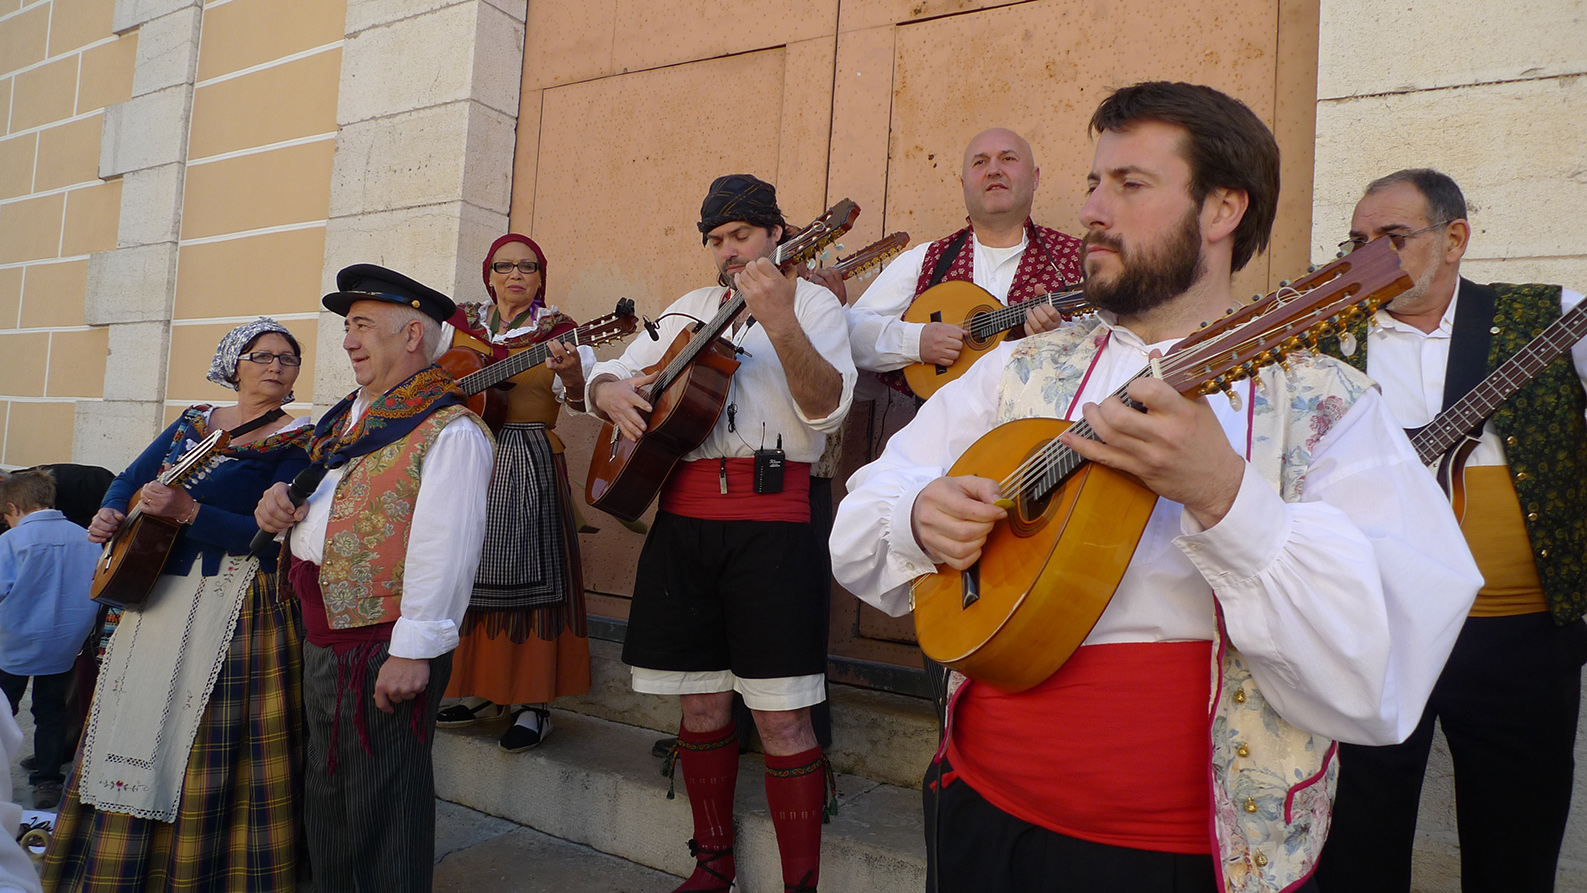 2014-02-23 - Baladre a Fira St. Marcia-ROTOVA (44)